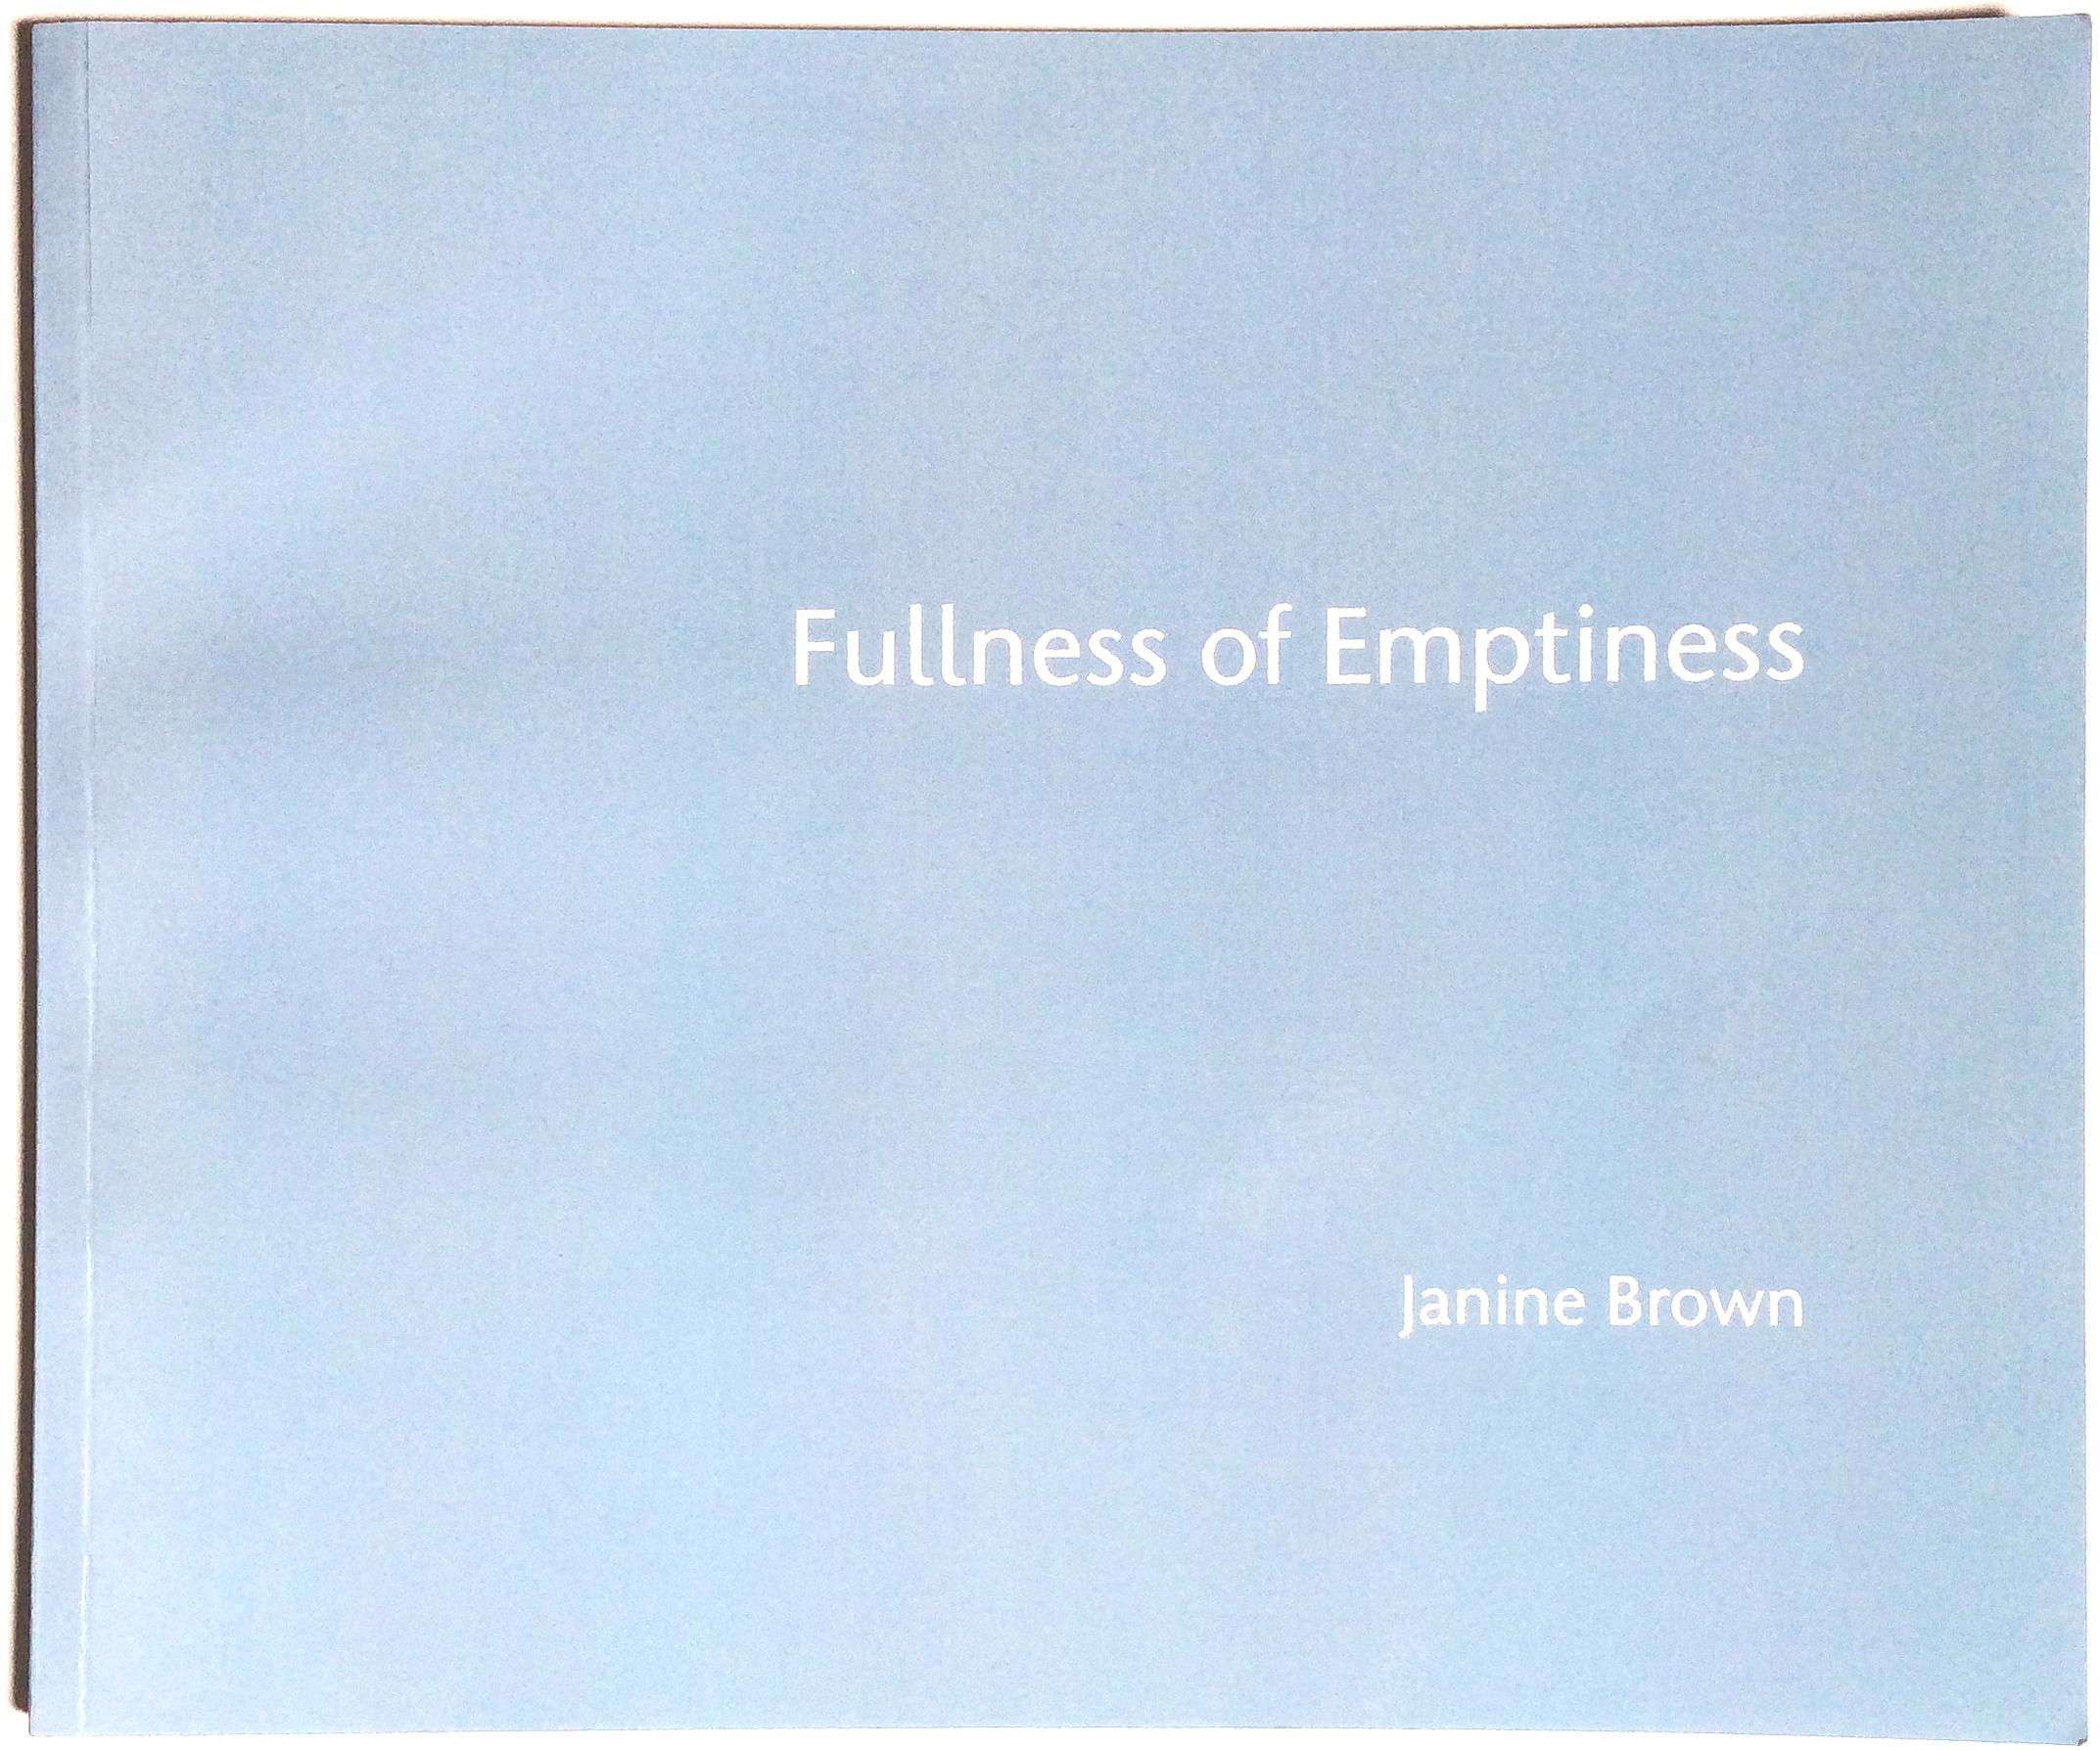 Fullness of Emptiness